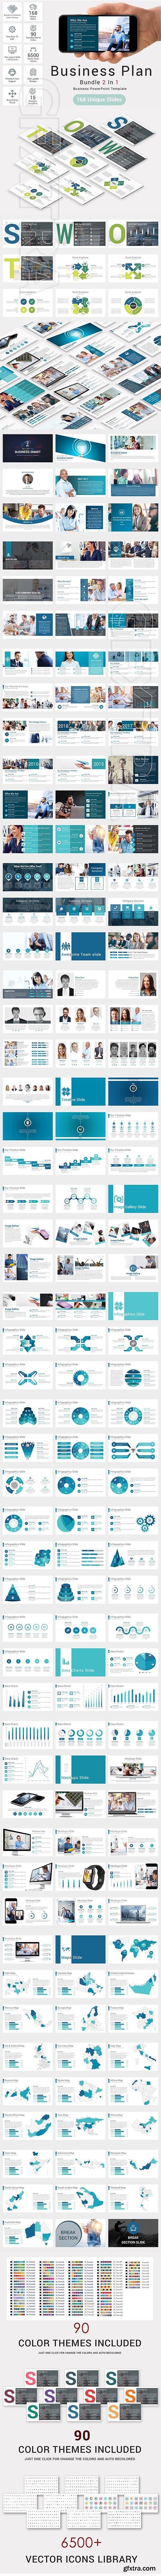 CreativeMarket - Bundle 2 In 1 Business Plan Template 2636526